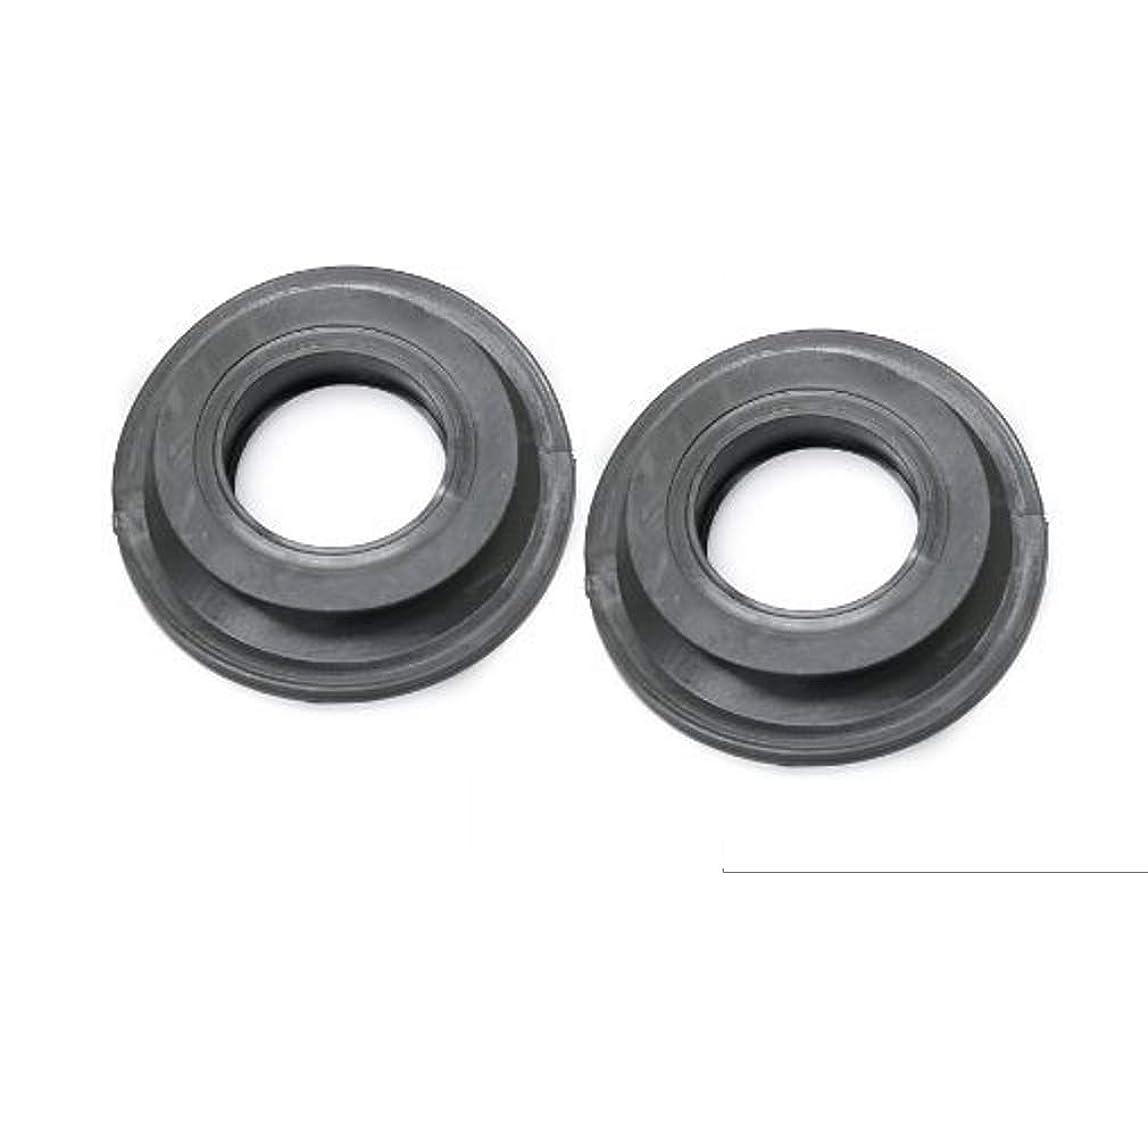 Yak-Gear Drip Ring Kit wejclxl910522